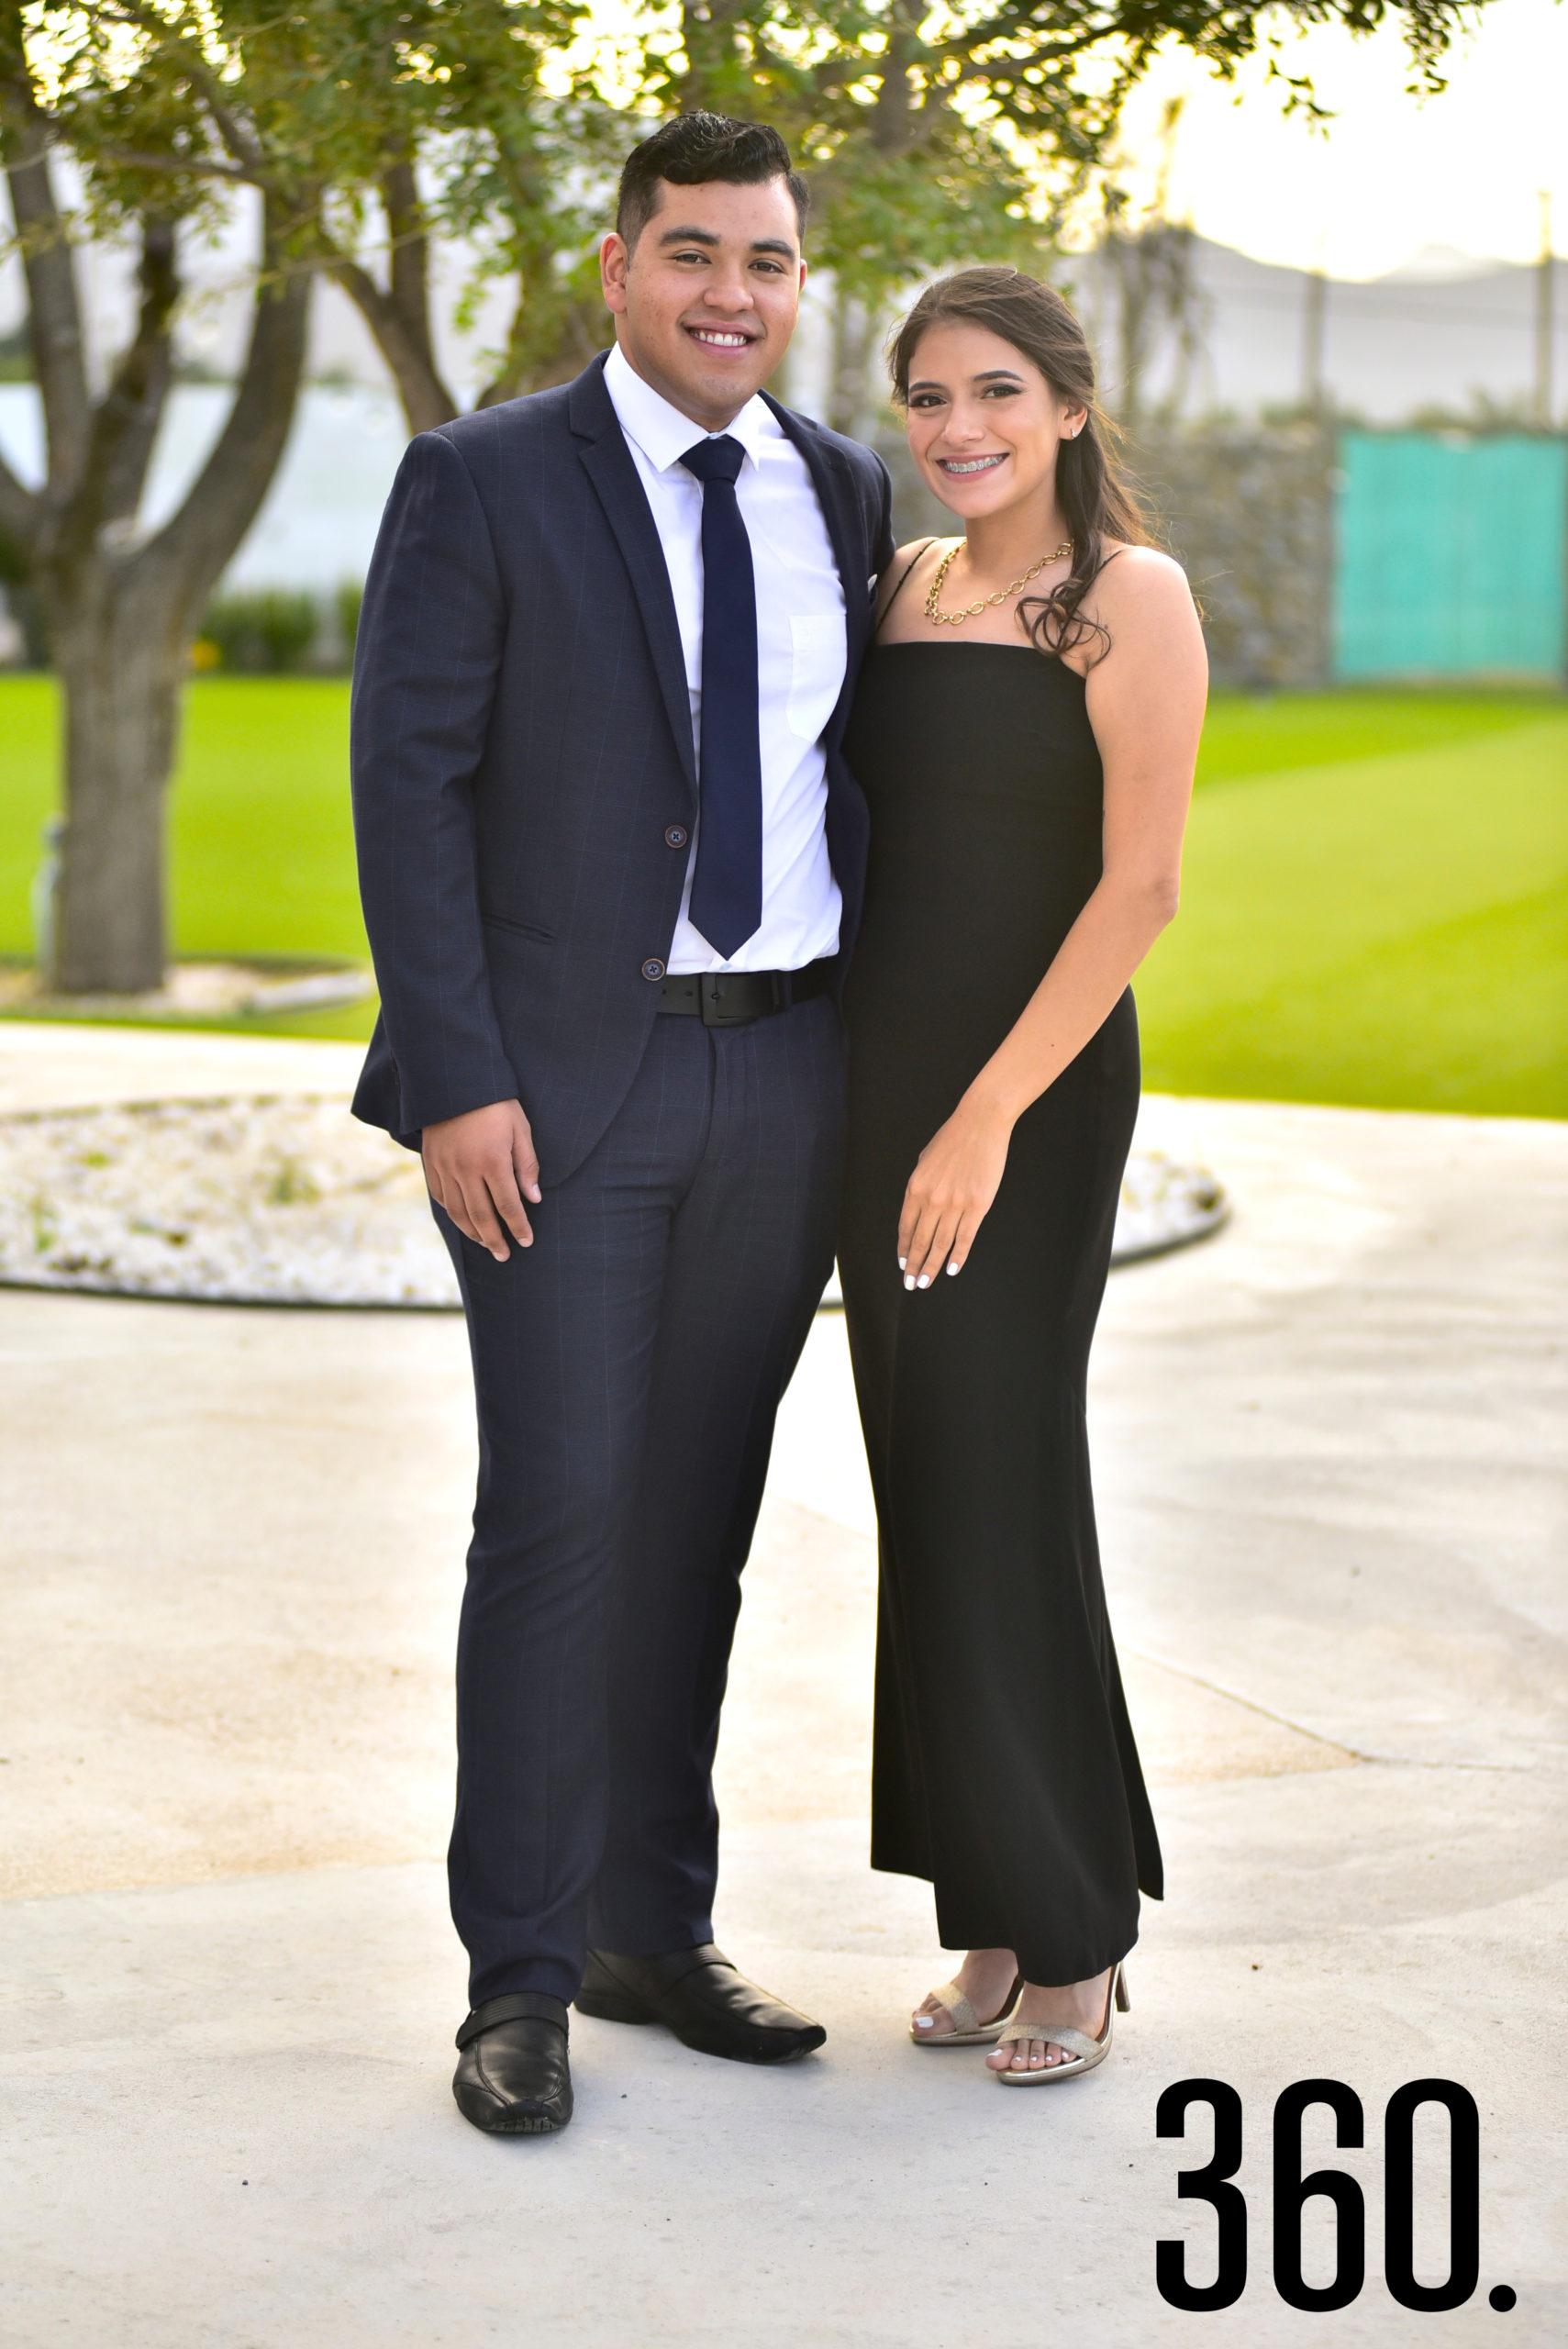 Alonso Almaguer y Mariela Arrazola.